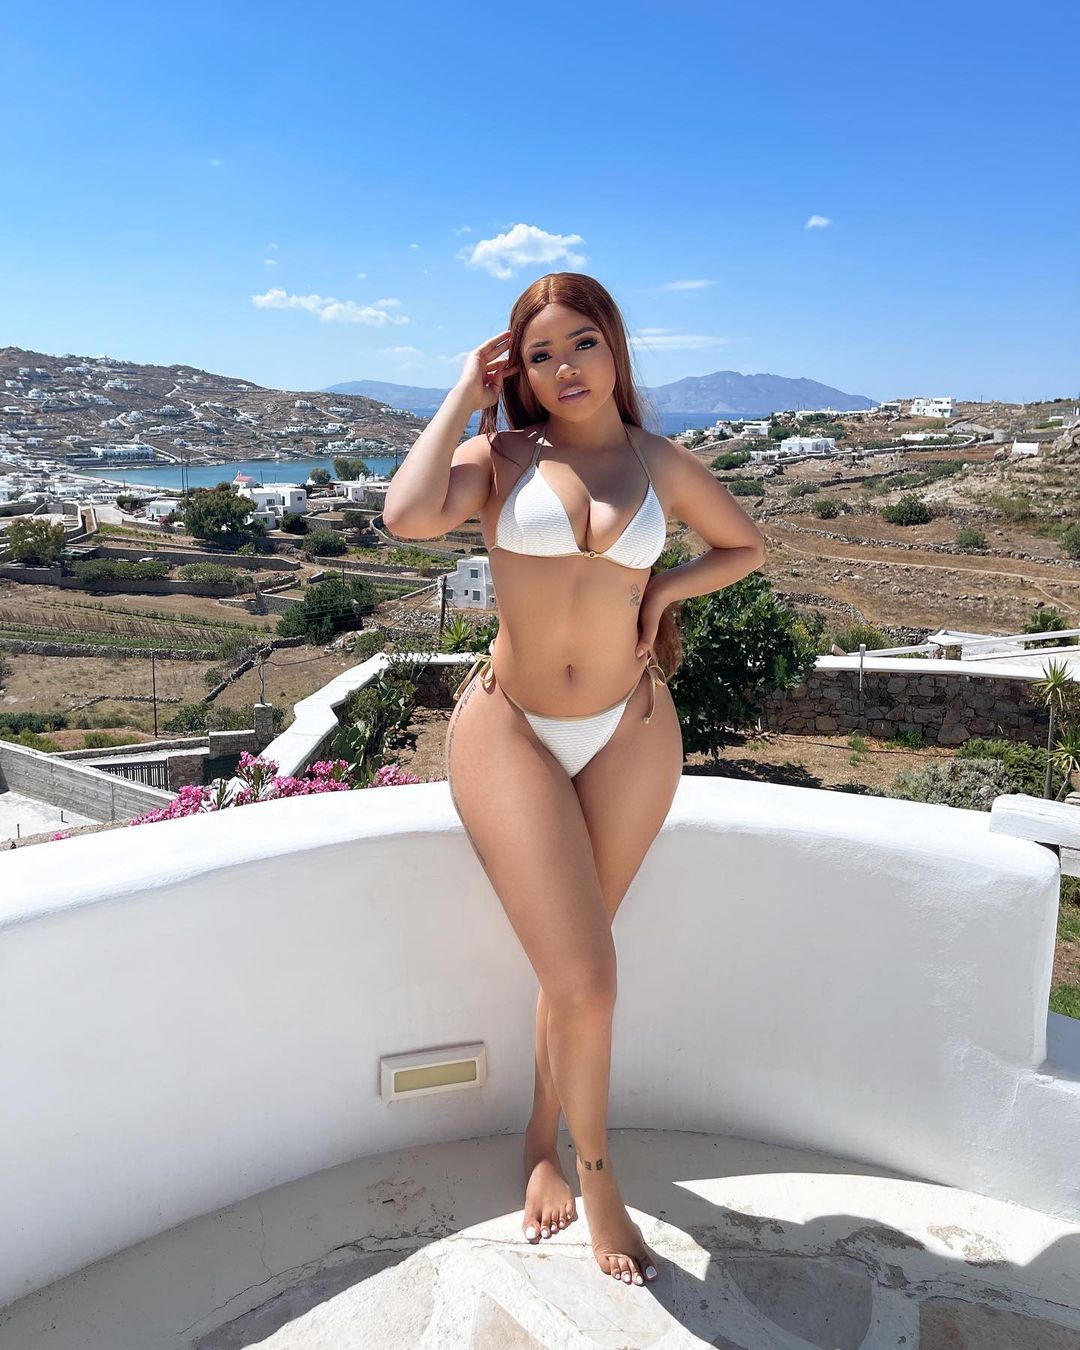 Sun, Sea & Swimwear: BB Naija Nengi Shows Off Her Curves In Sultry Swimsuit